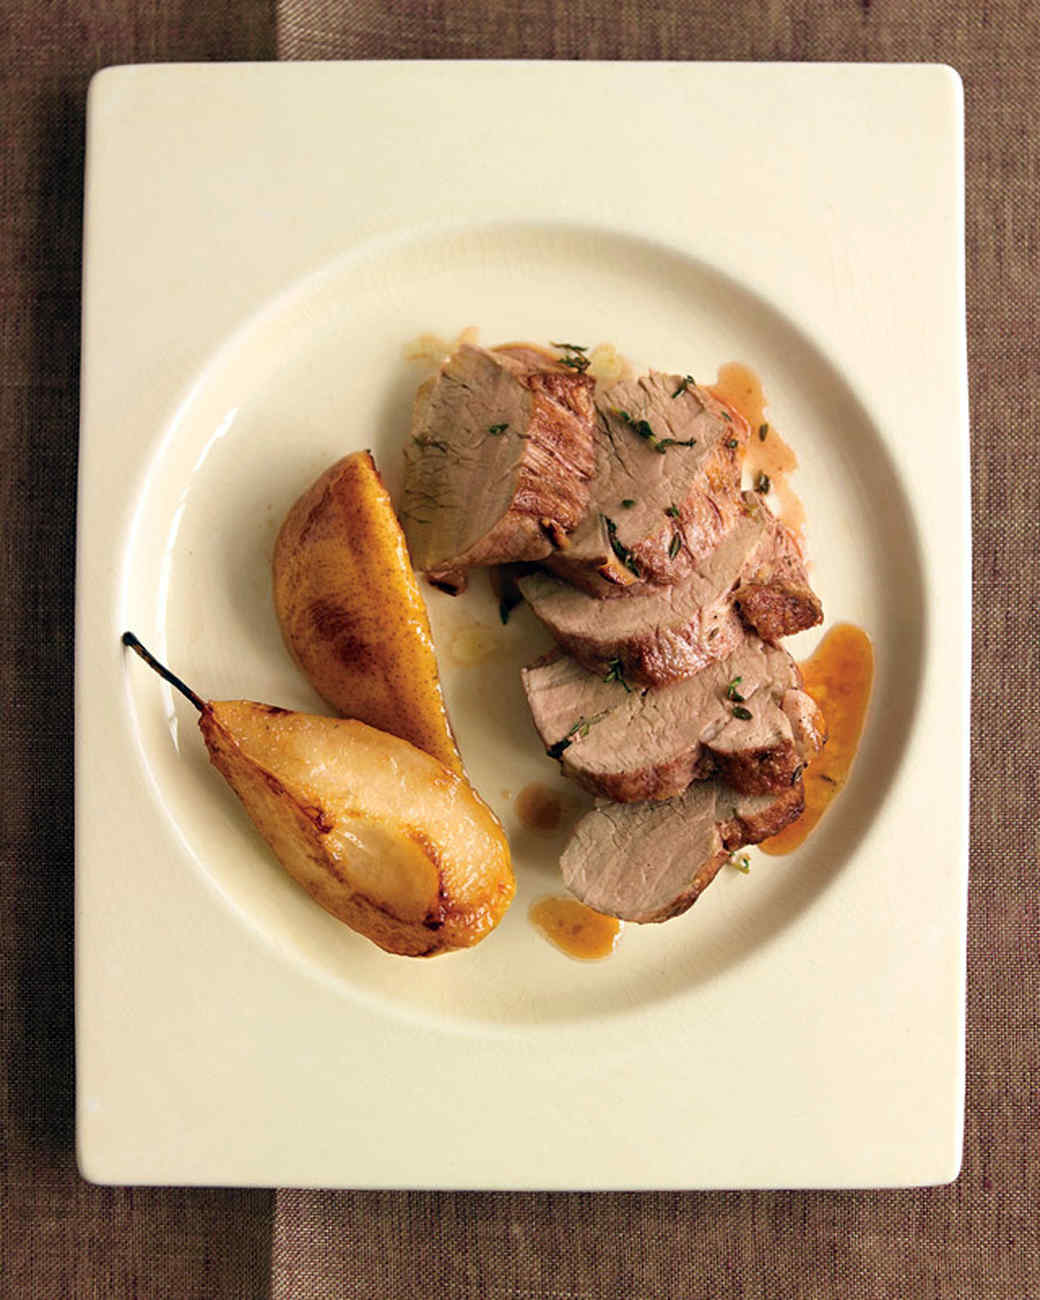 Herb-Roasted Pork Tenderloin with Pears